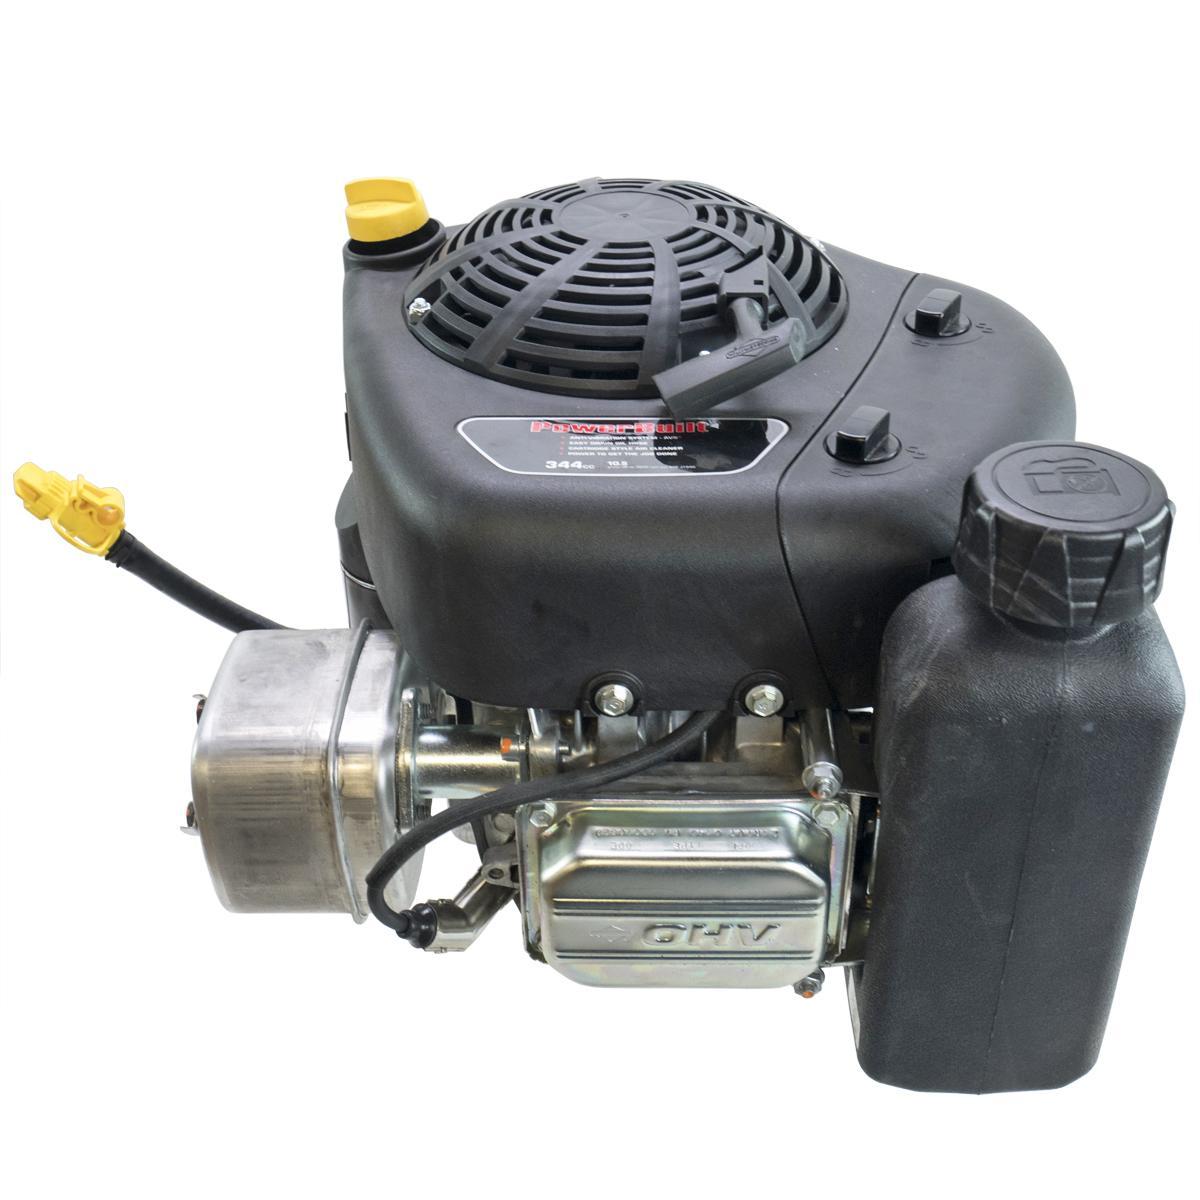 "10.5hp Vertical 1""x3-5/32"" Shaft, Intek OHV, Recoil+Electric Start, 9 Amp Alternator, Fuel Tank, Muffler, Briggs   Stratton Engi"